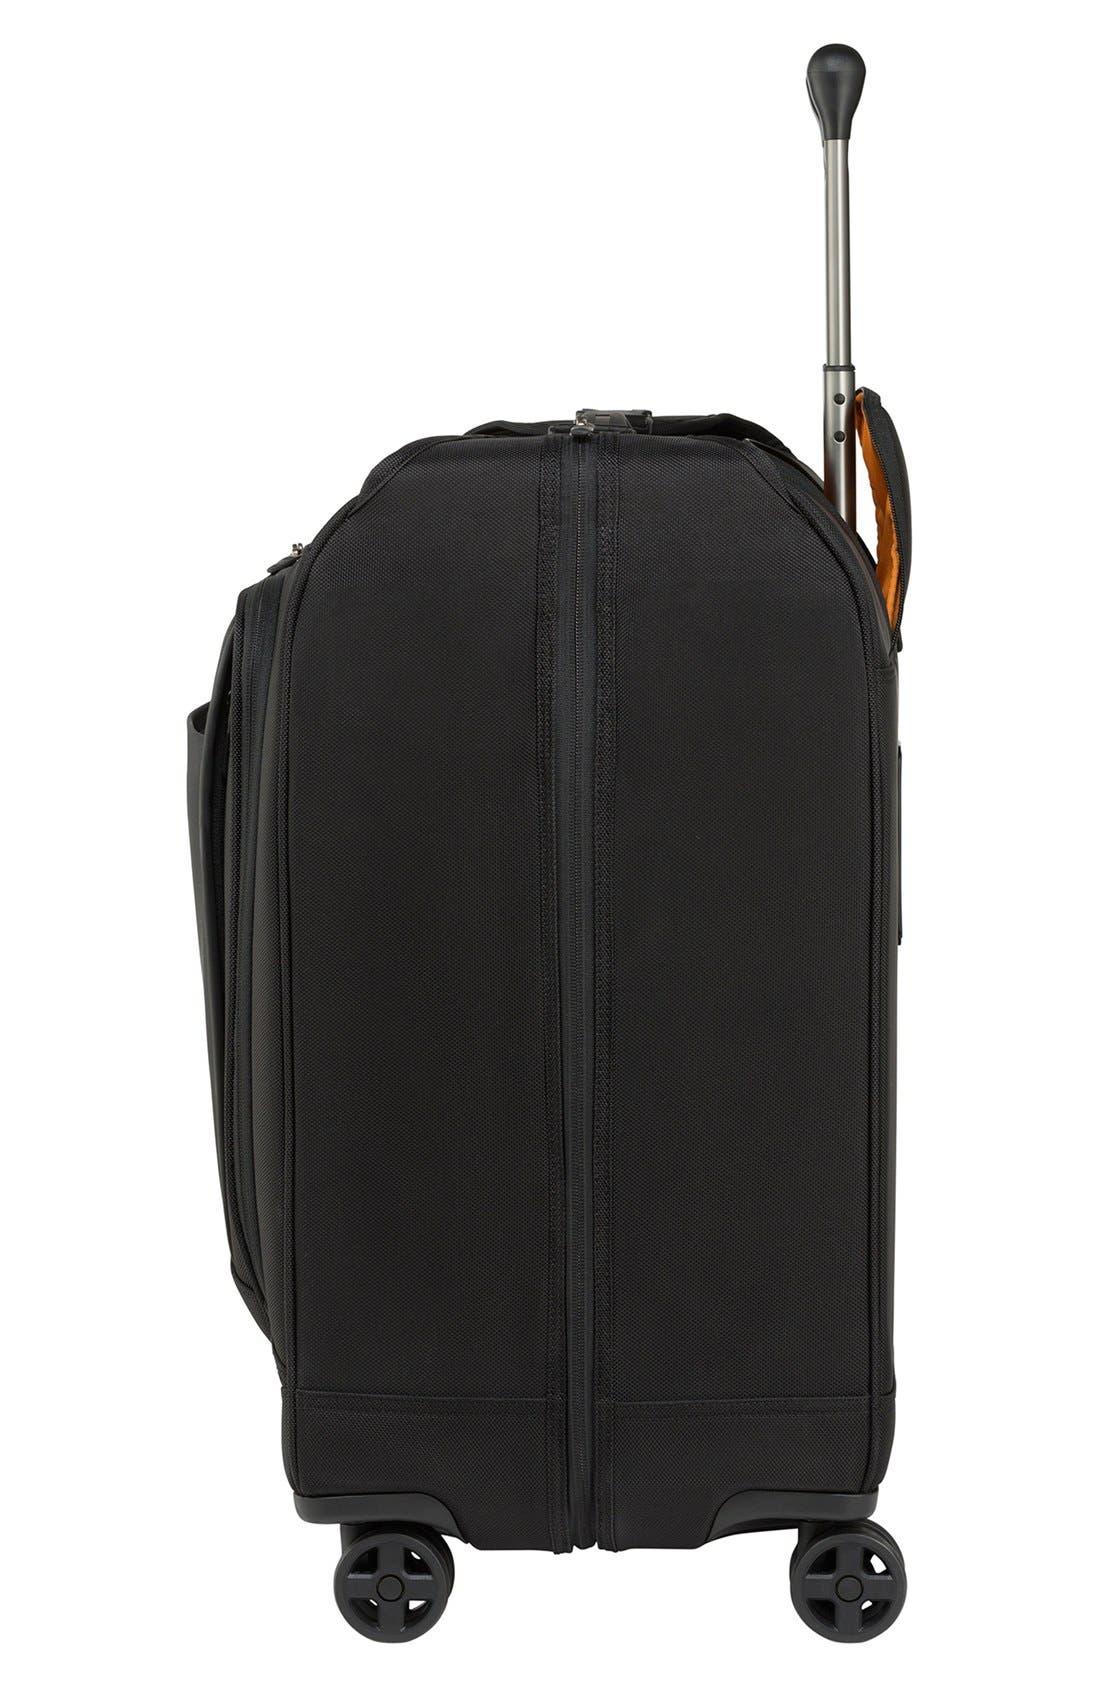 WT 5.0 Dual Caster Wheeled Garment Bag,                             Alternate thumbnail 4, color,                             001